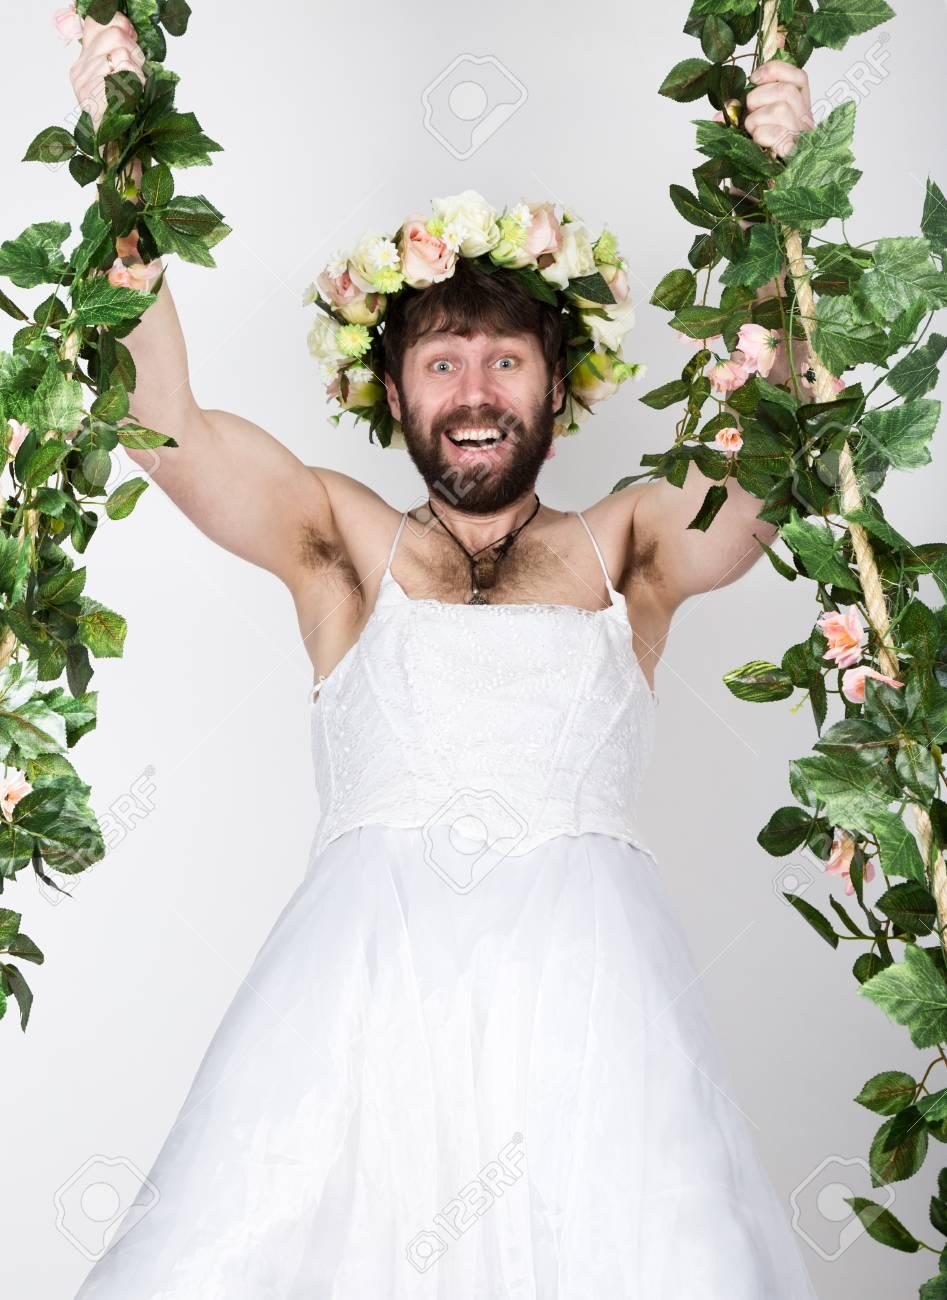 Funny Men in Wedding Dresses